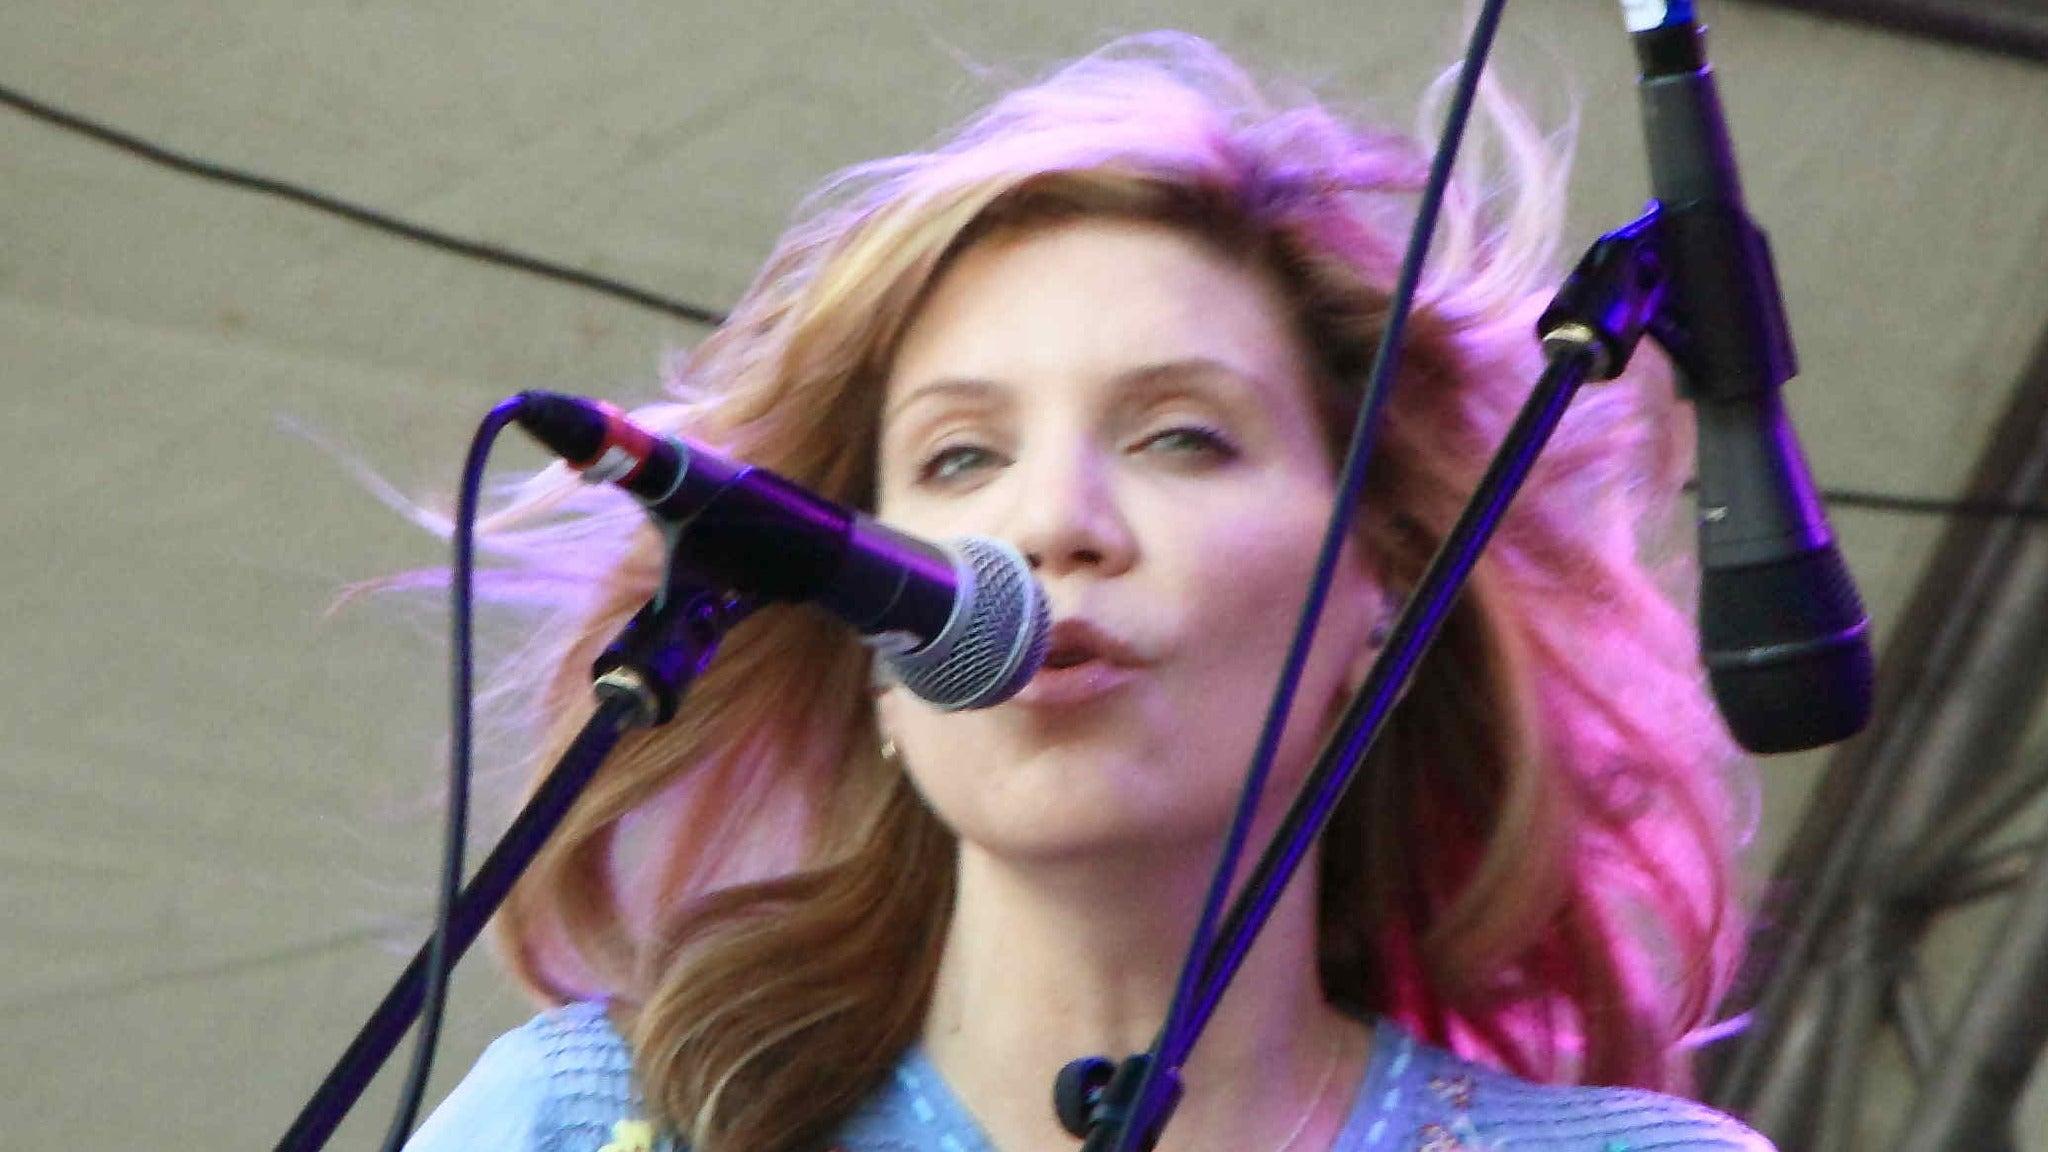 Alison Krauss at The Anthem - DC